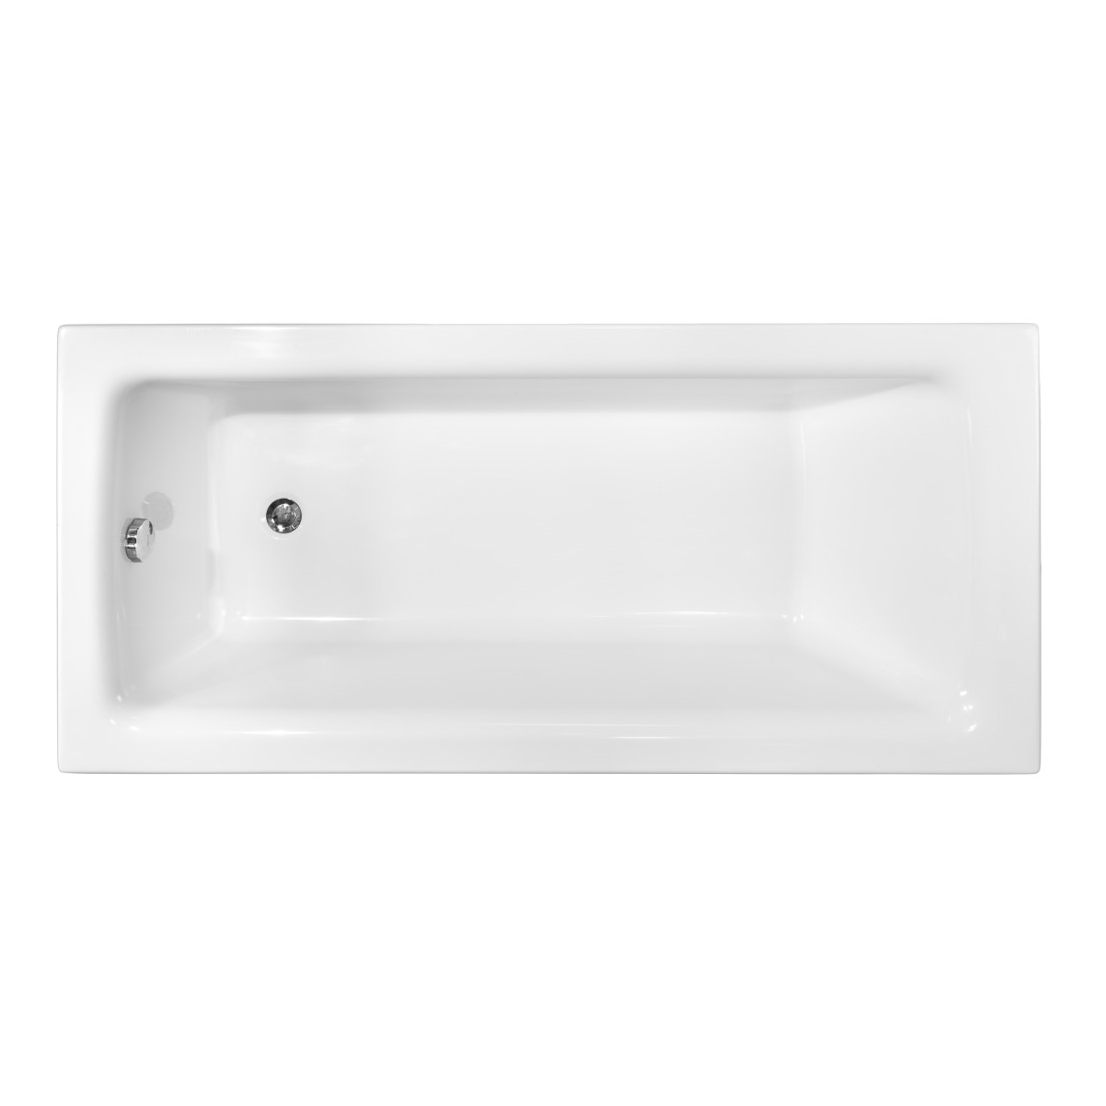 Акриловая ванна Besco Talia 160x75 цены онлайн